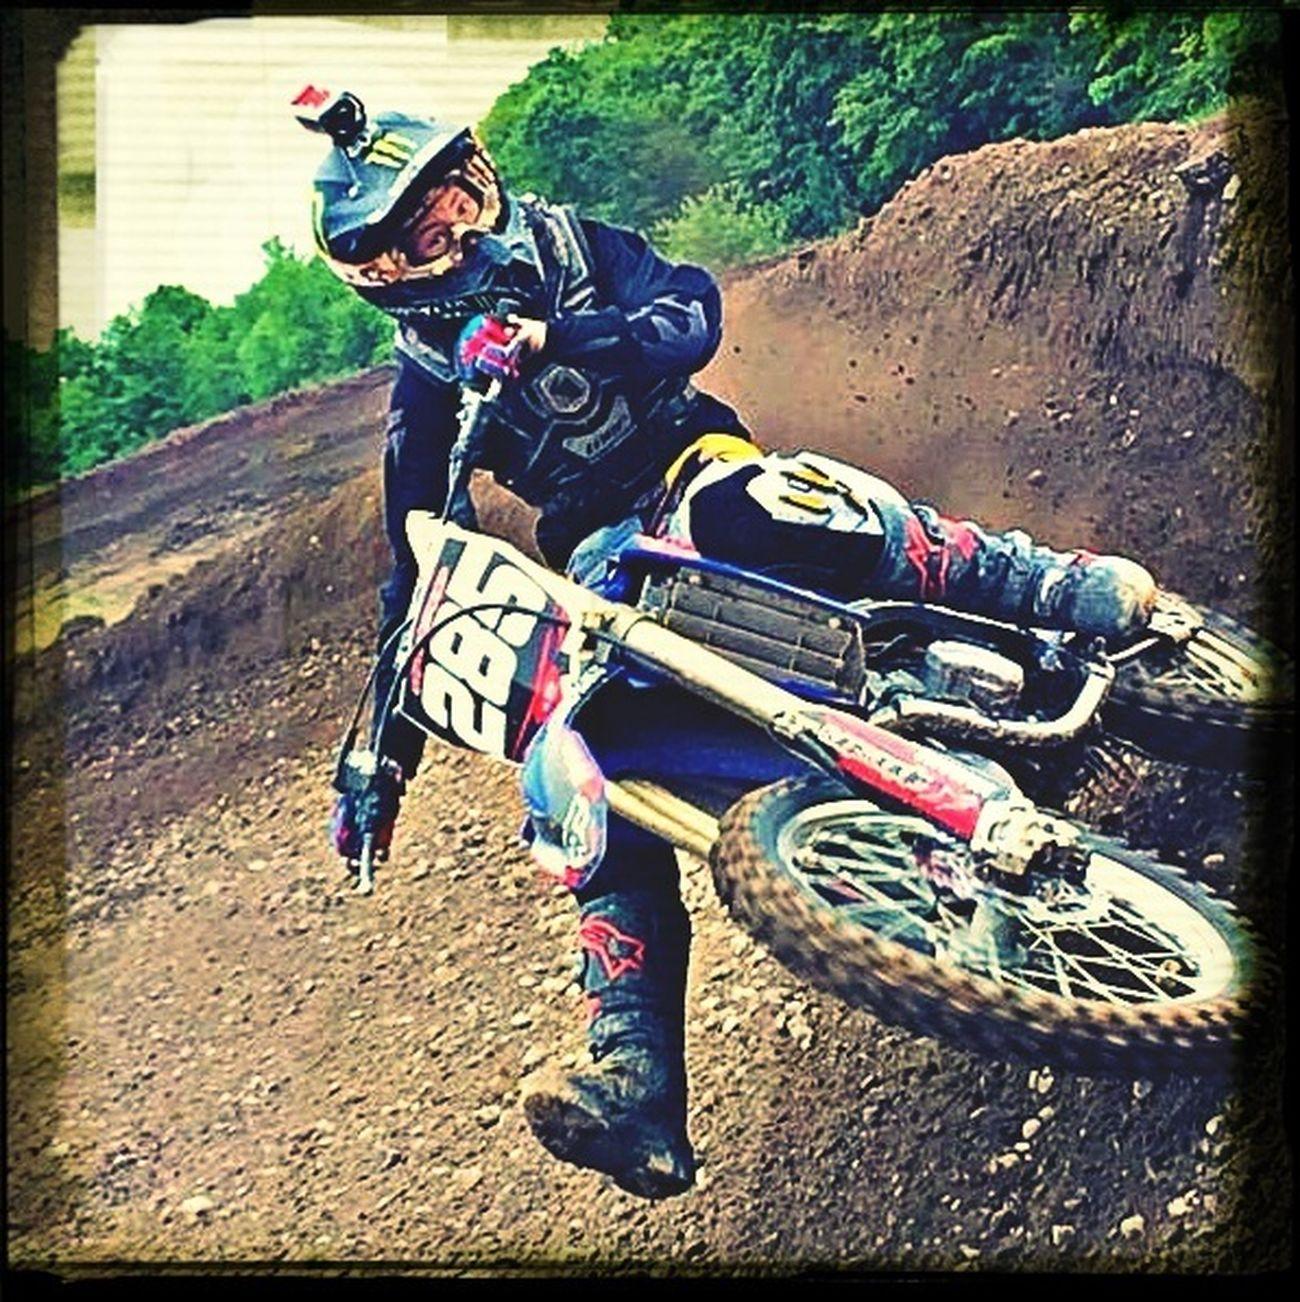 Motopark rocks! I <3 Motocross Mx4l Yz125